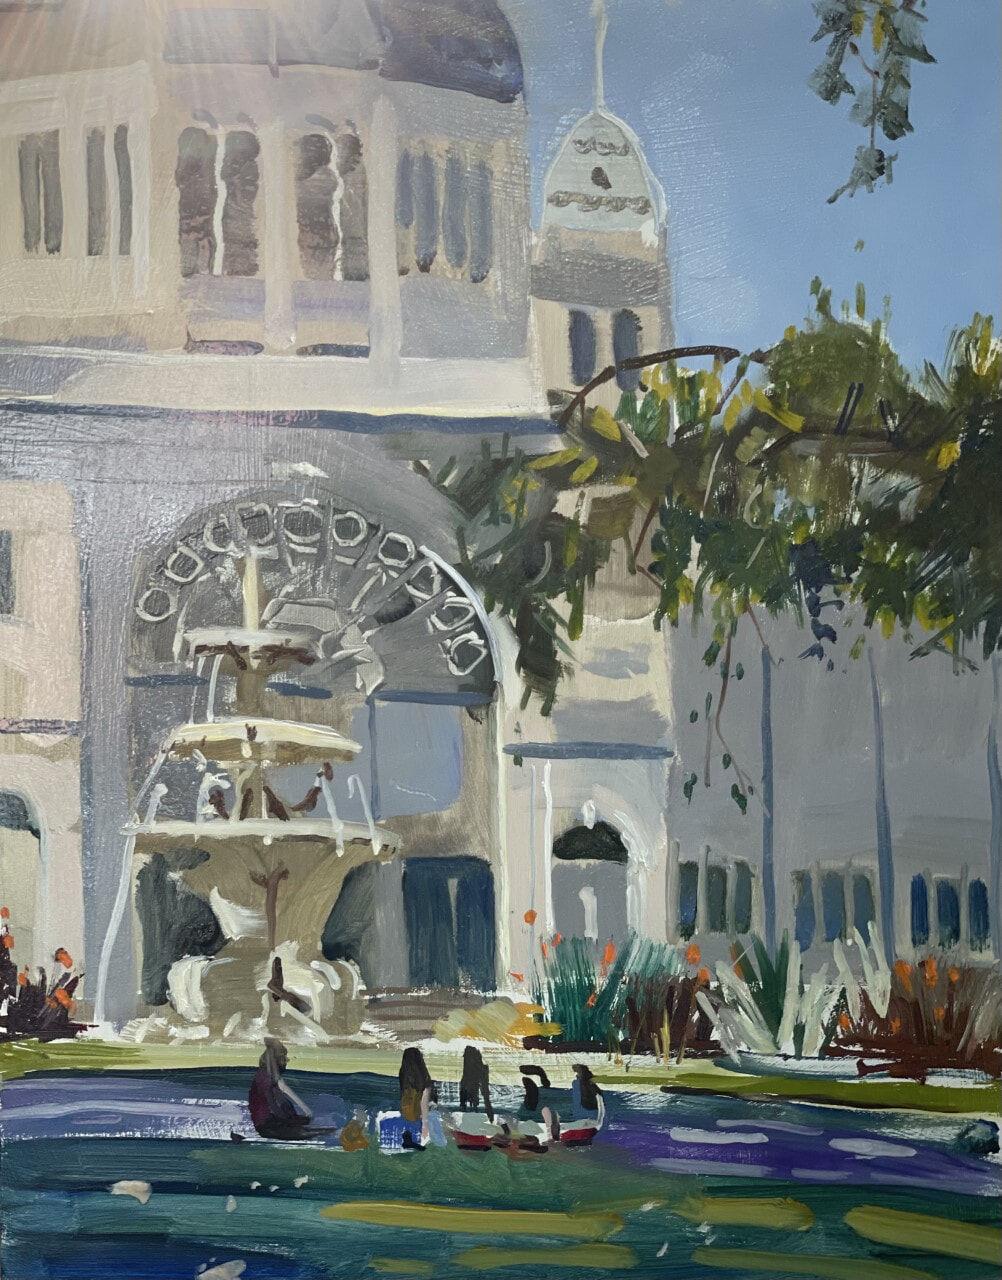 Exhibition Gardens, Ray Wilson